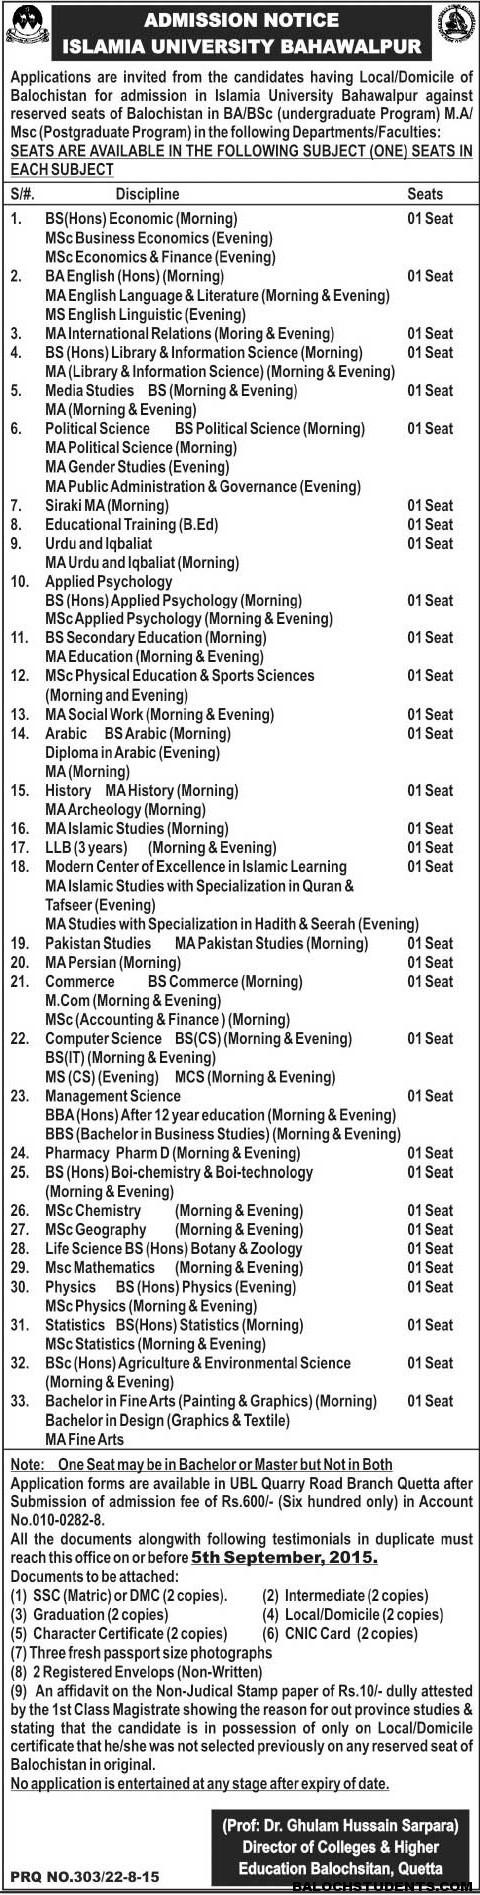 Islamia University Bahawalpur- Admission For Balochistan